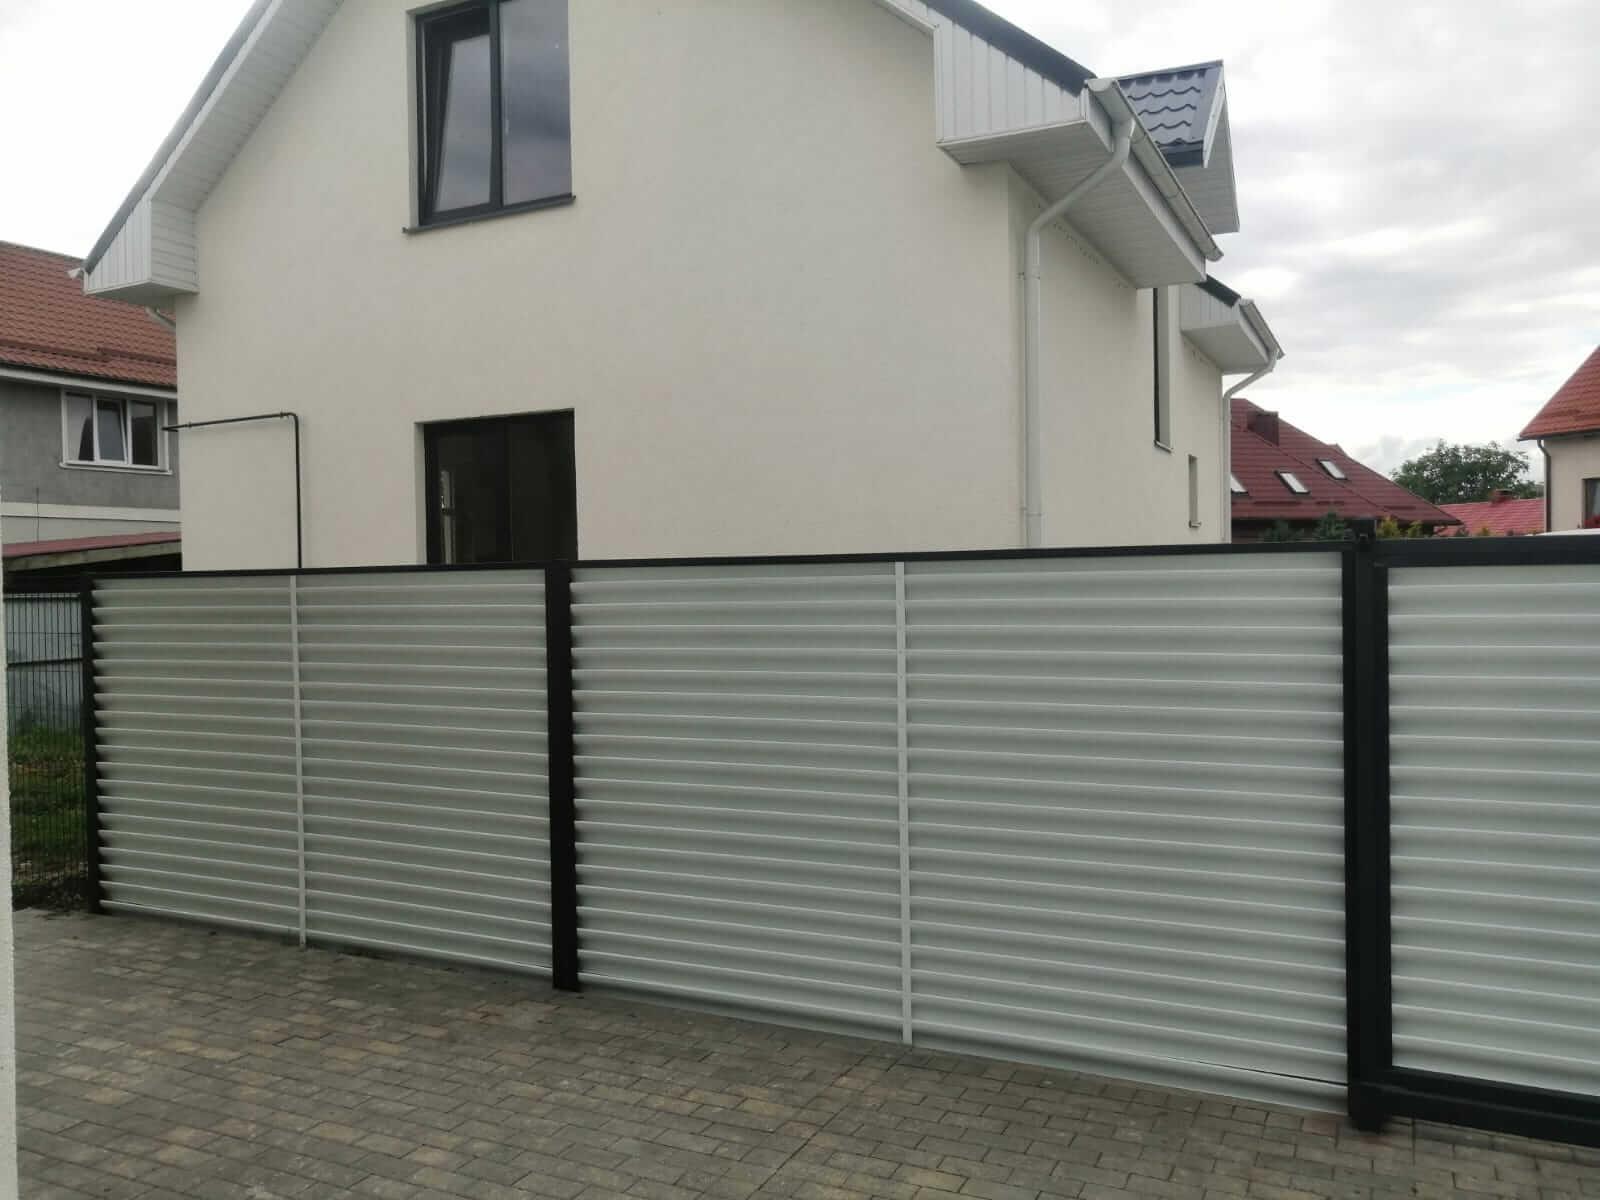 забор-жалюзи белый двухсторонний фото8